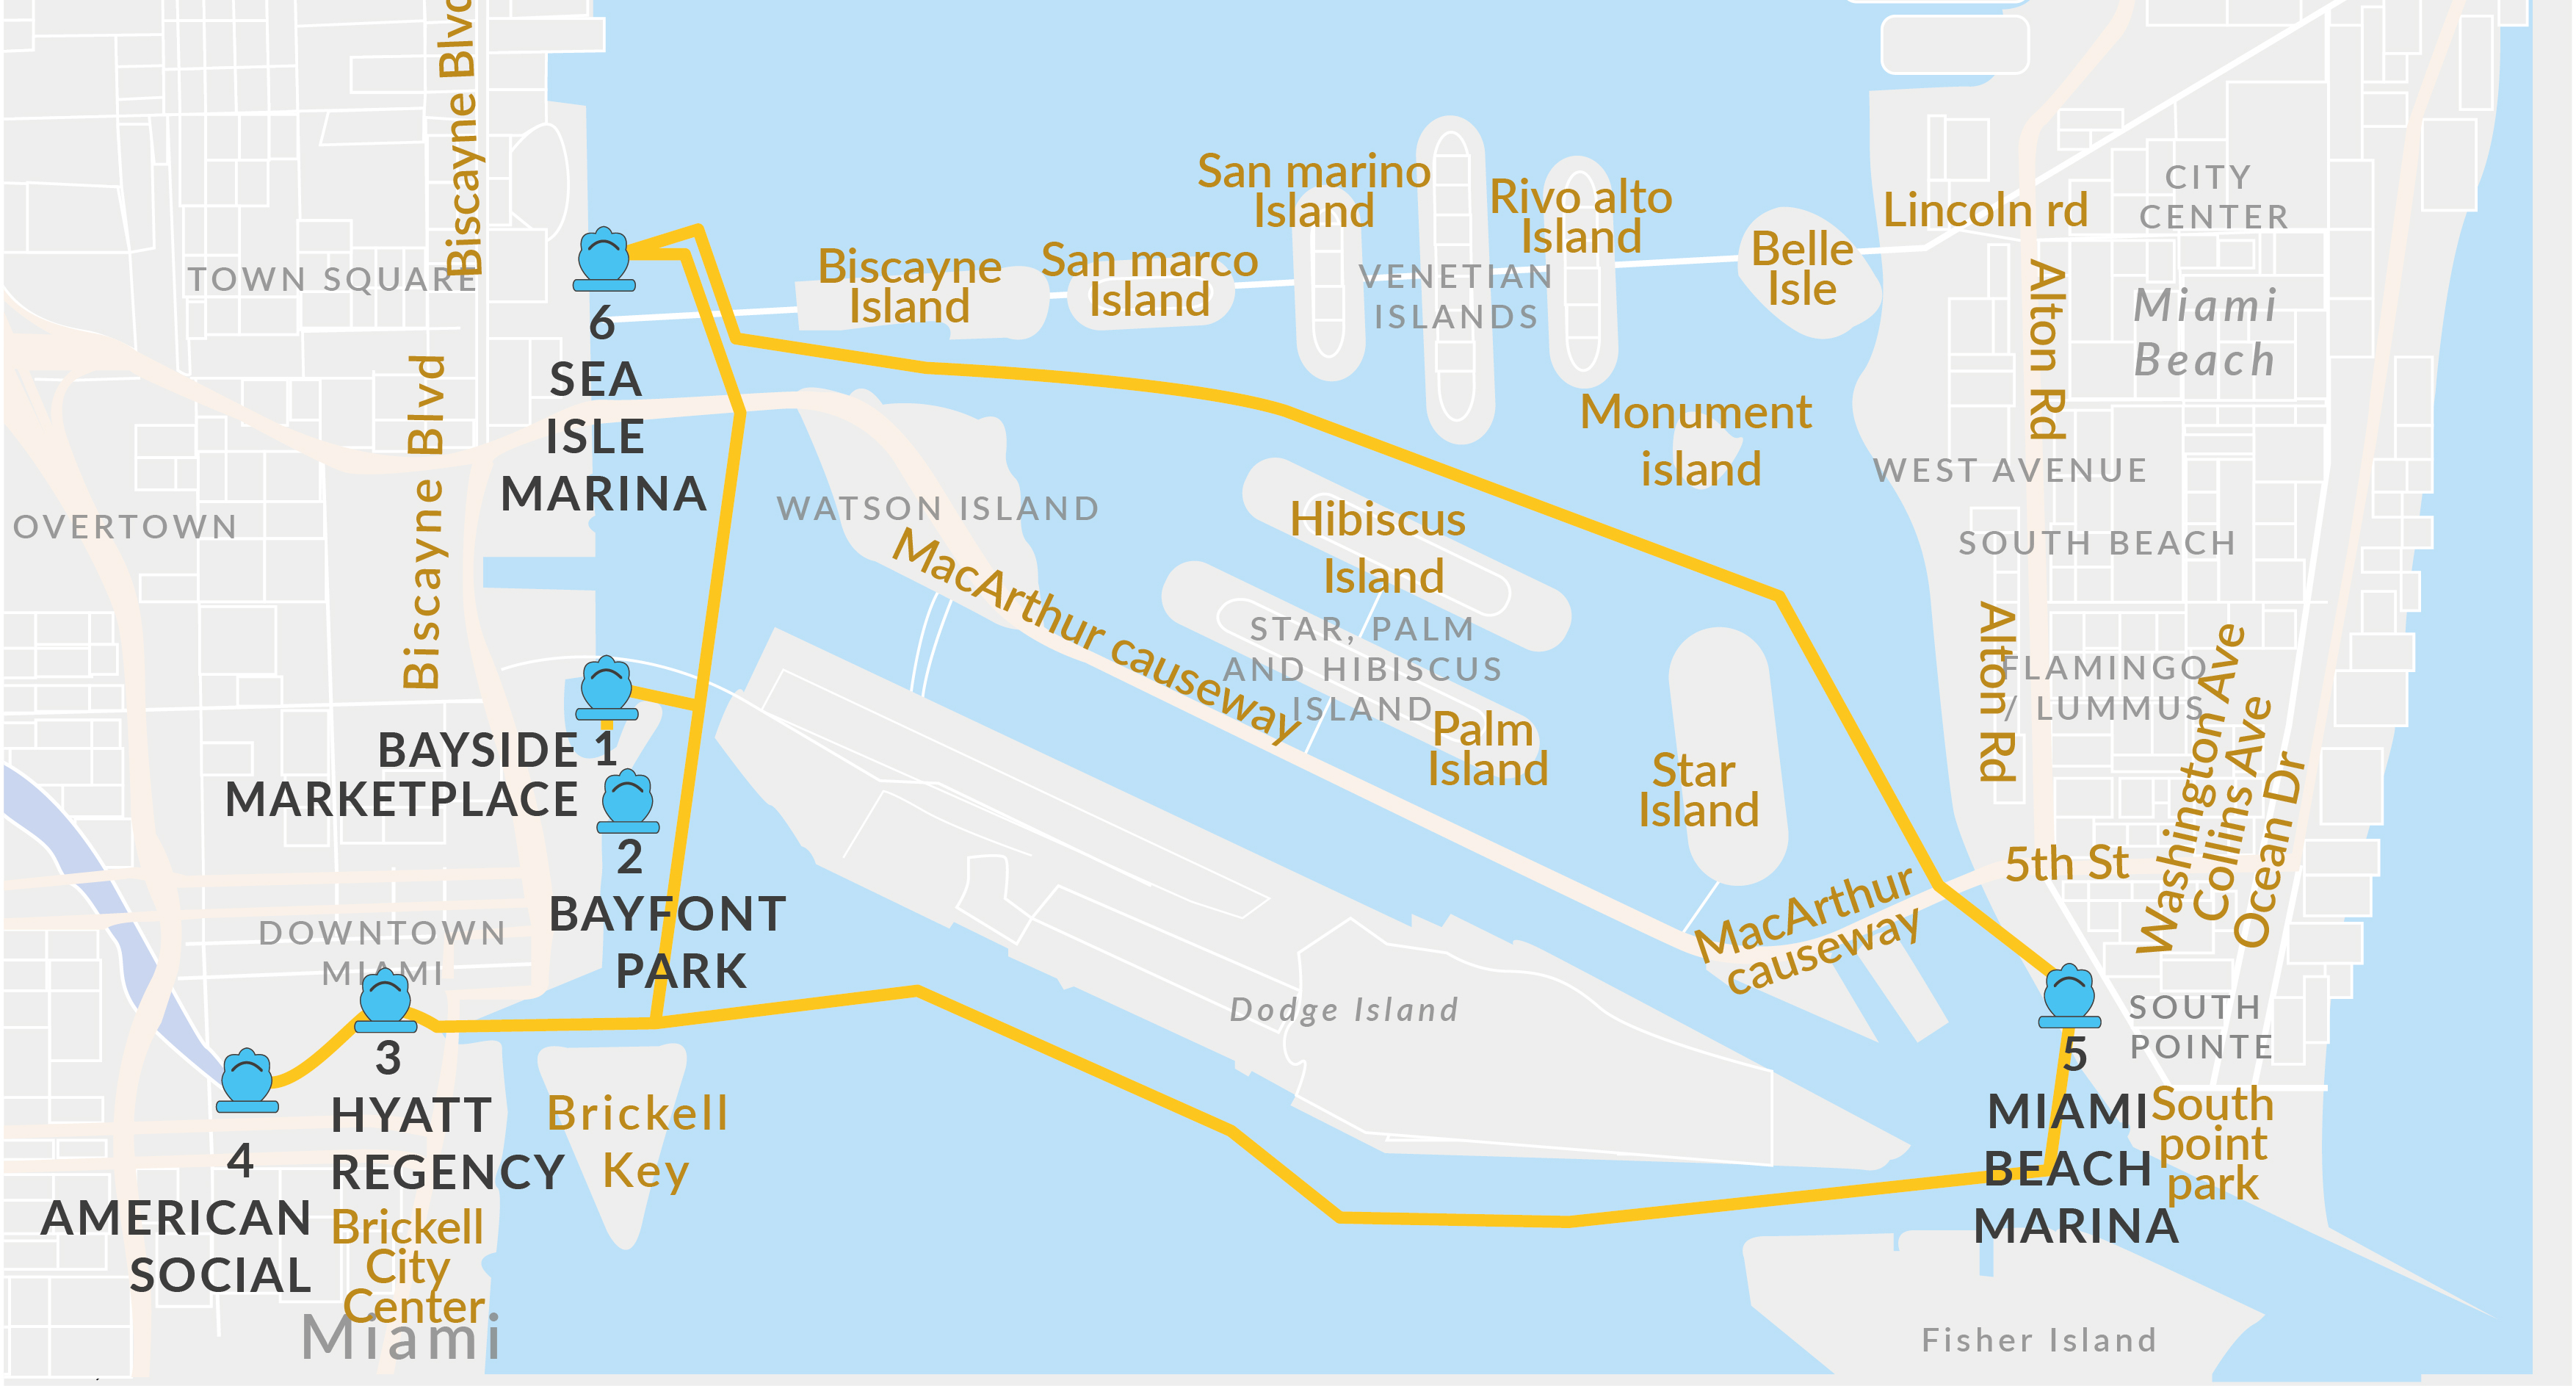 Miami Water Taxi Schedule Route Map | Miami Beach Water Taxi Schedule - Sunny Isles Beach Florida Map